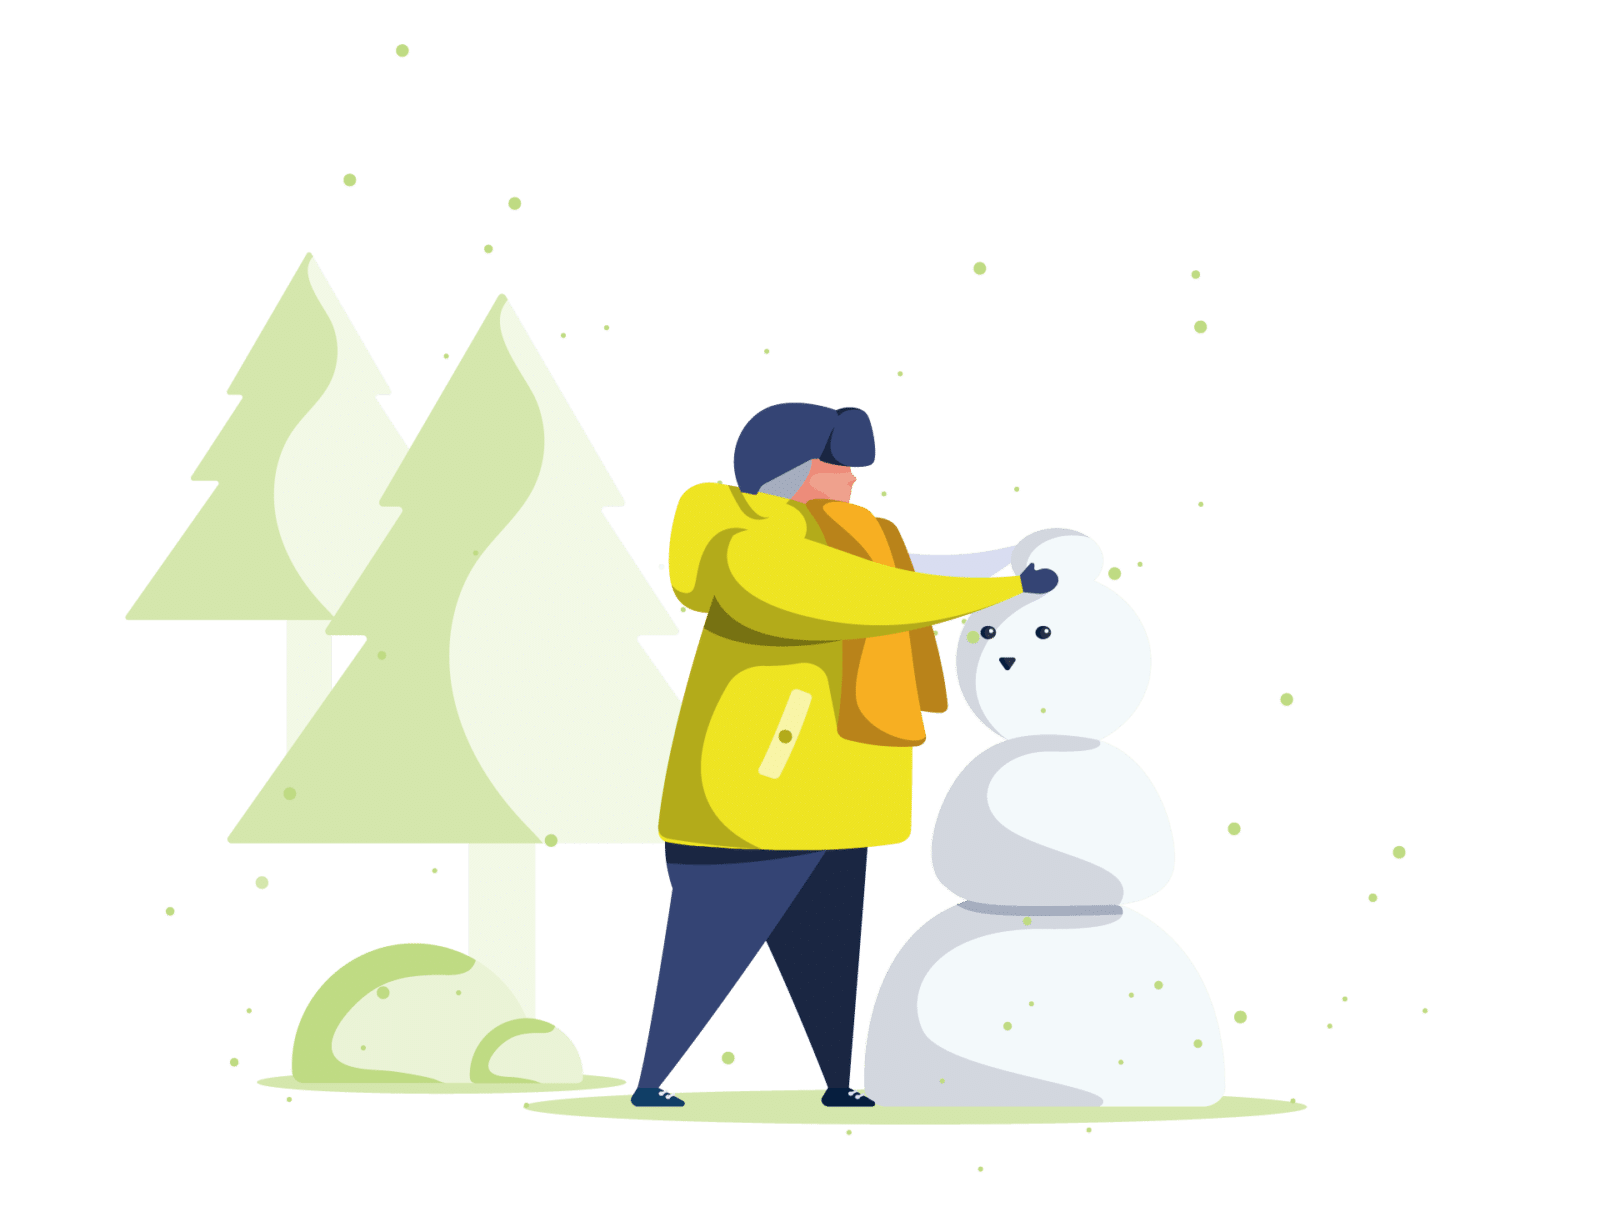 Barn leget i sne